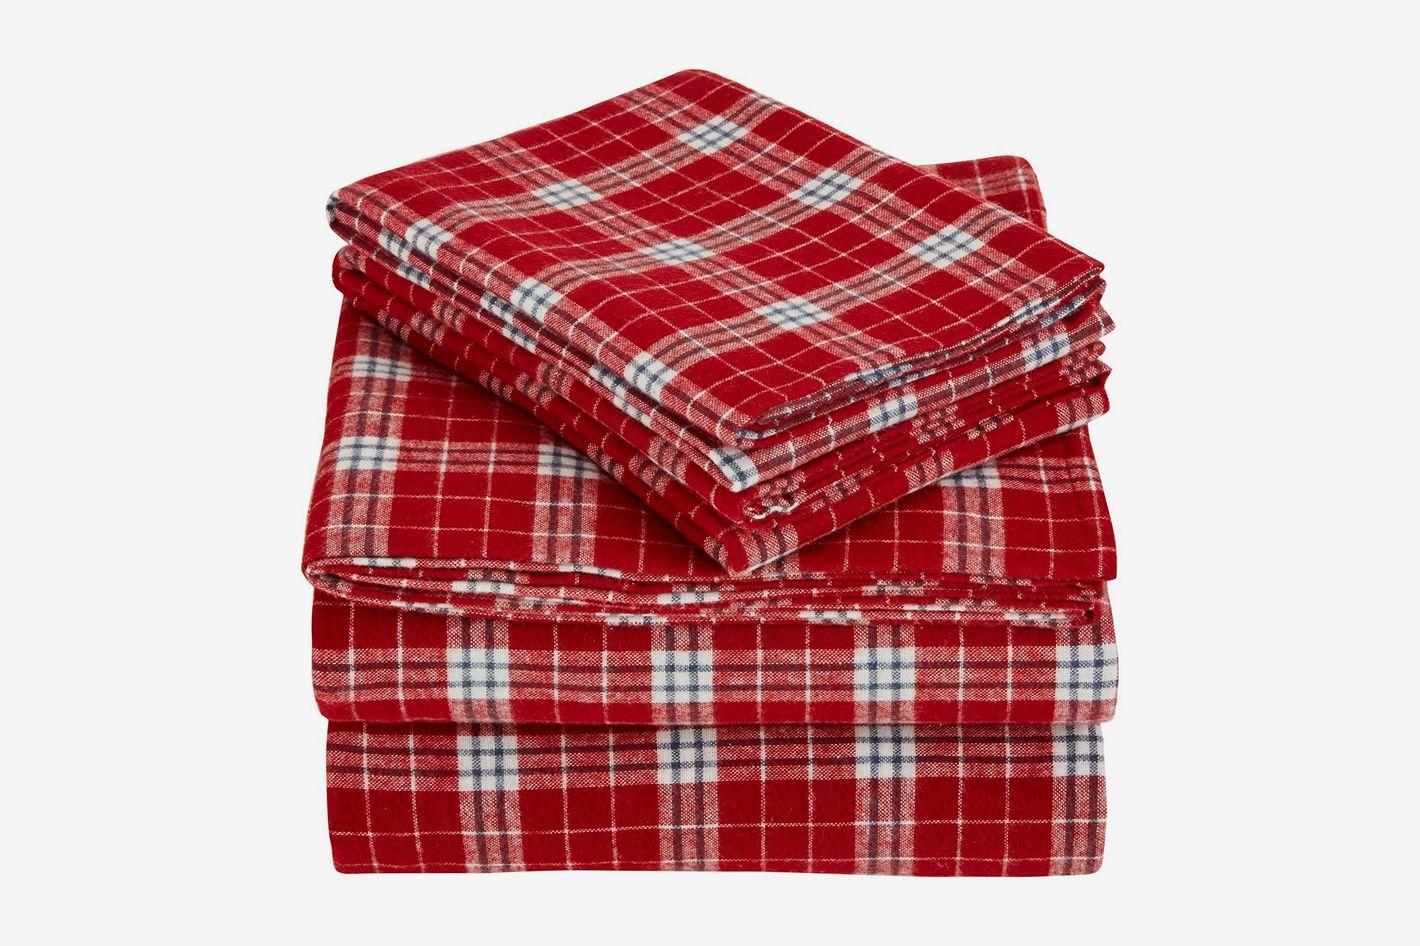 Pinzon 160 Gram Plaid Flannel Sheet Set (Queen)